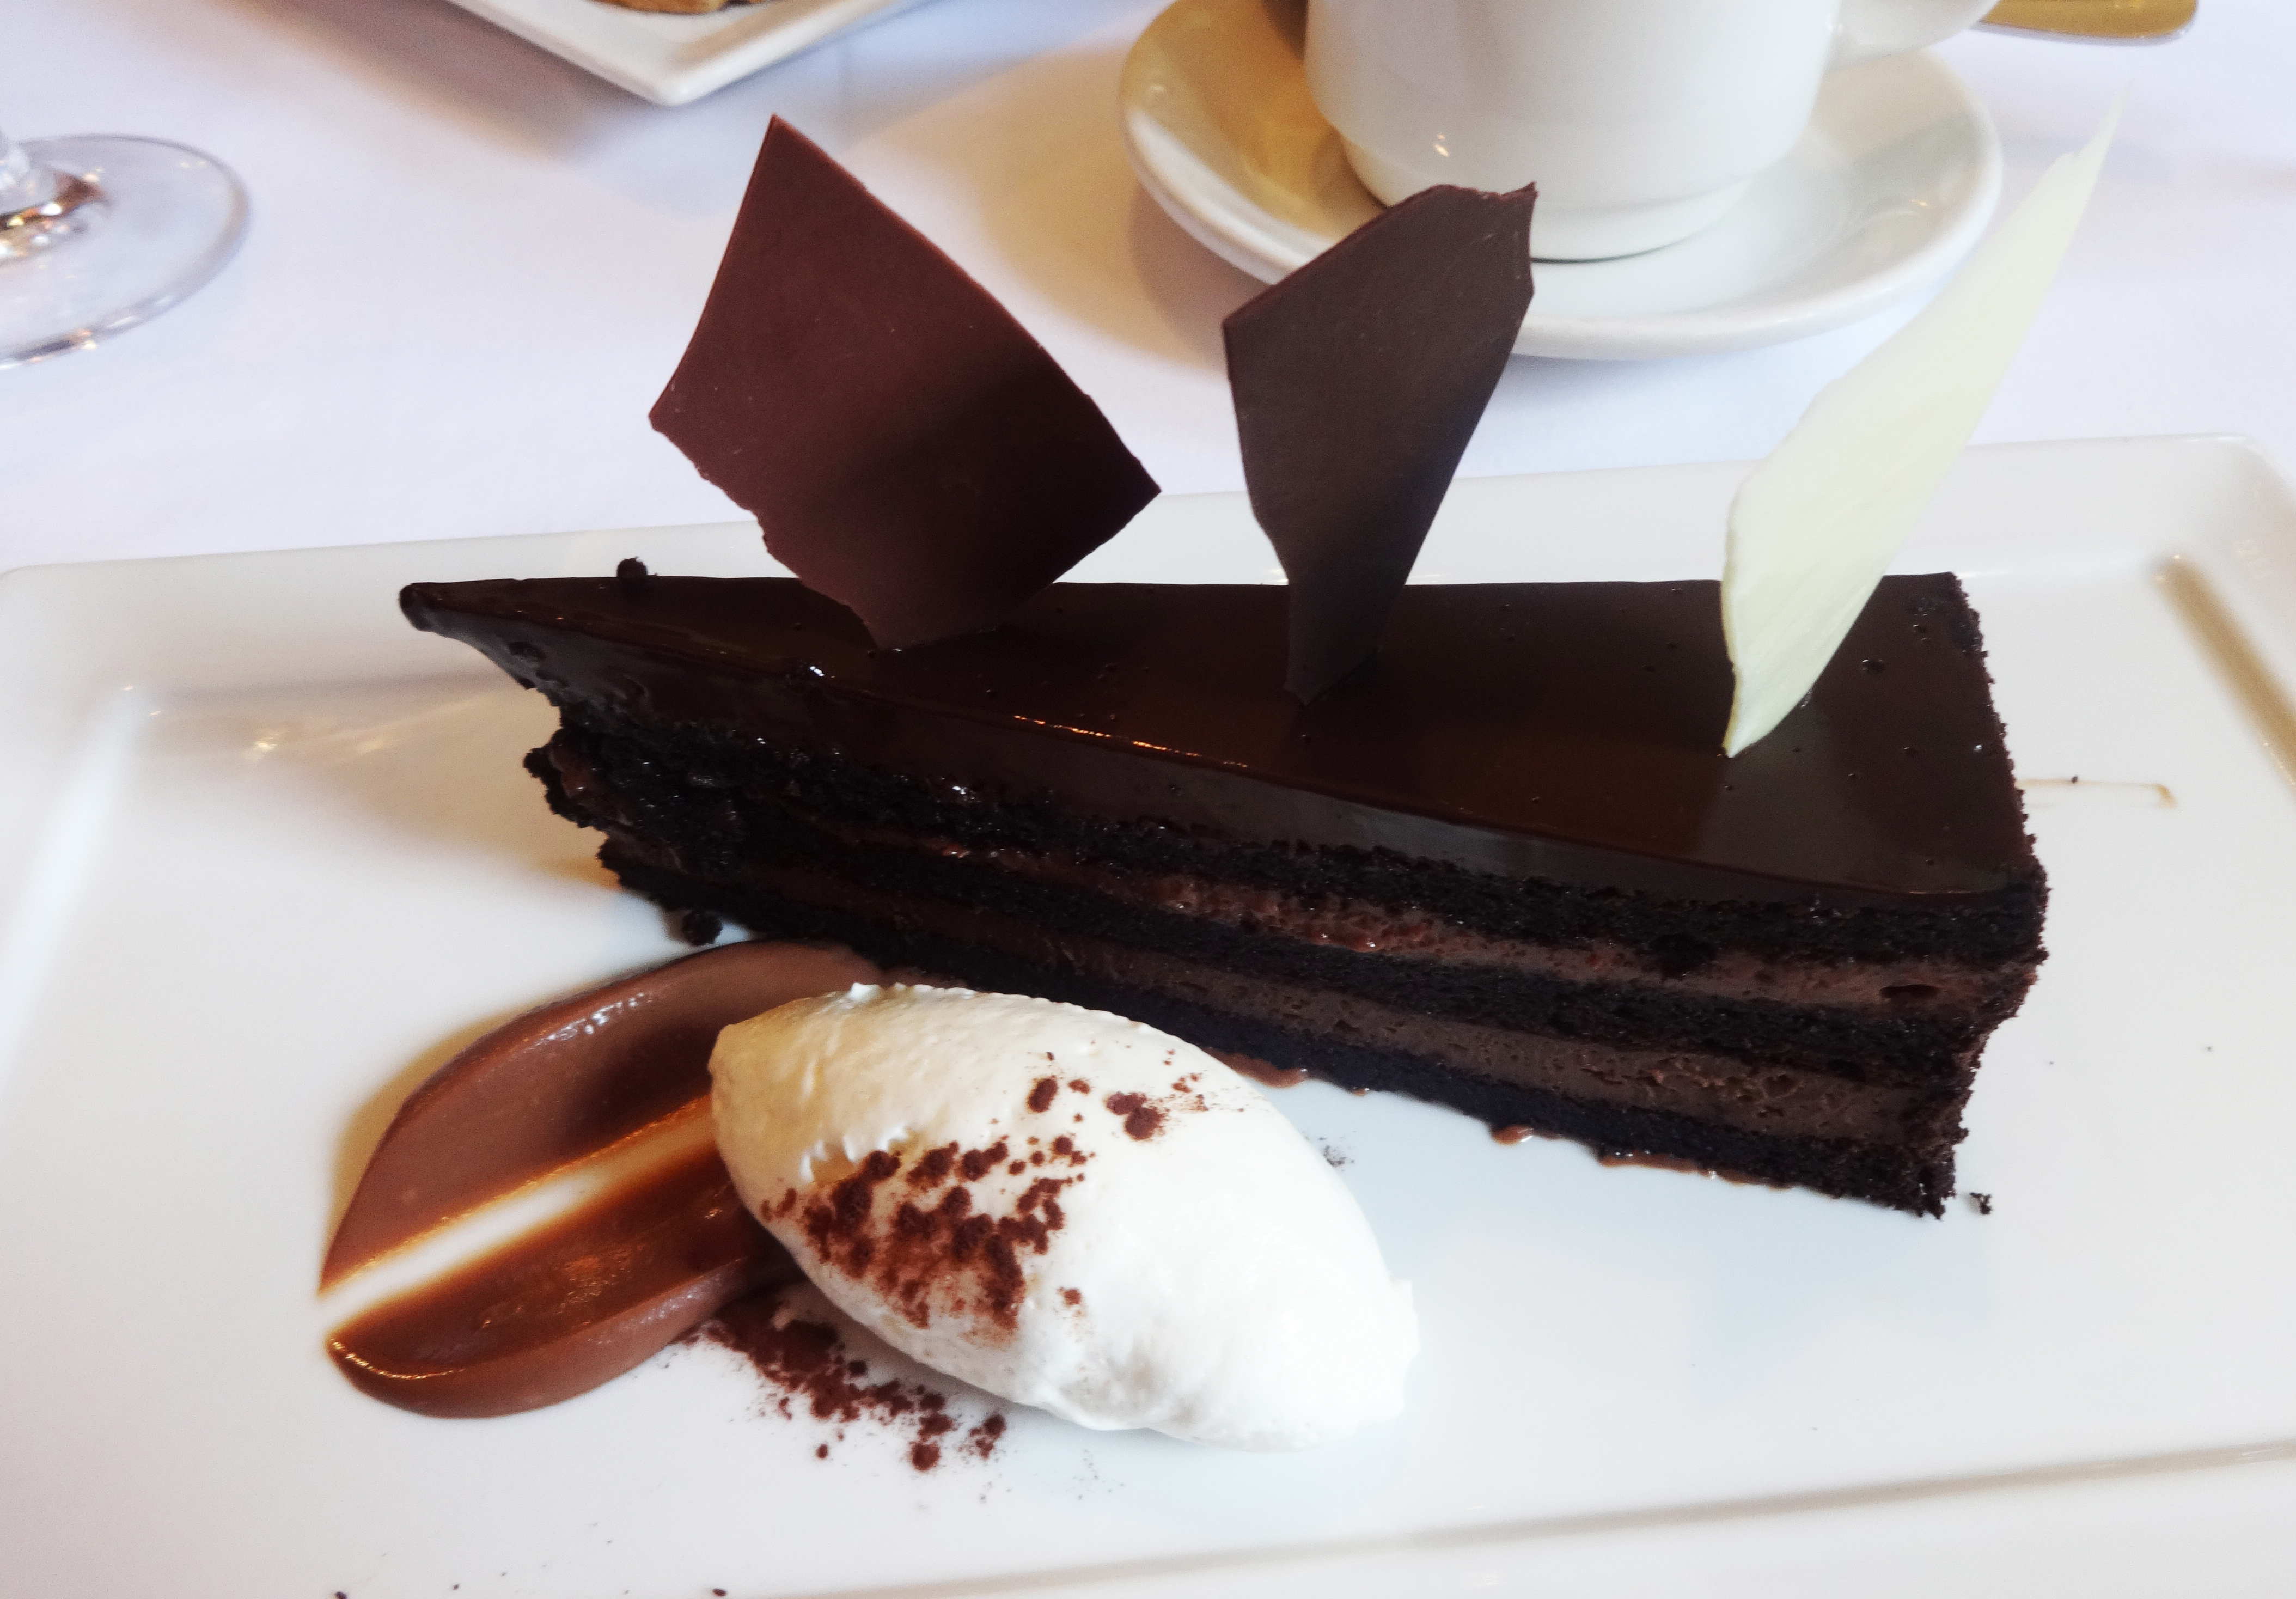 Tribeca chocoate cake